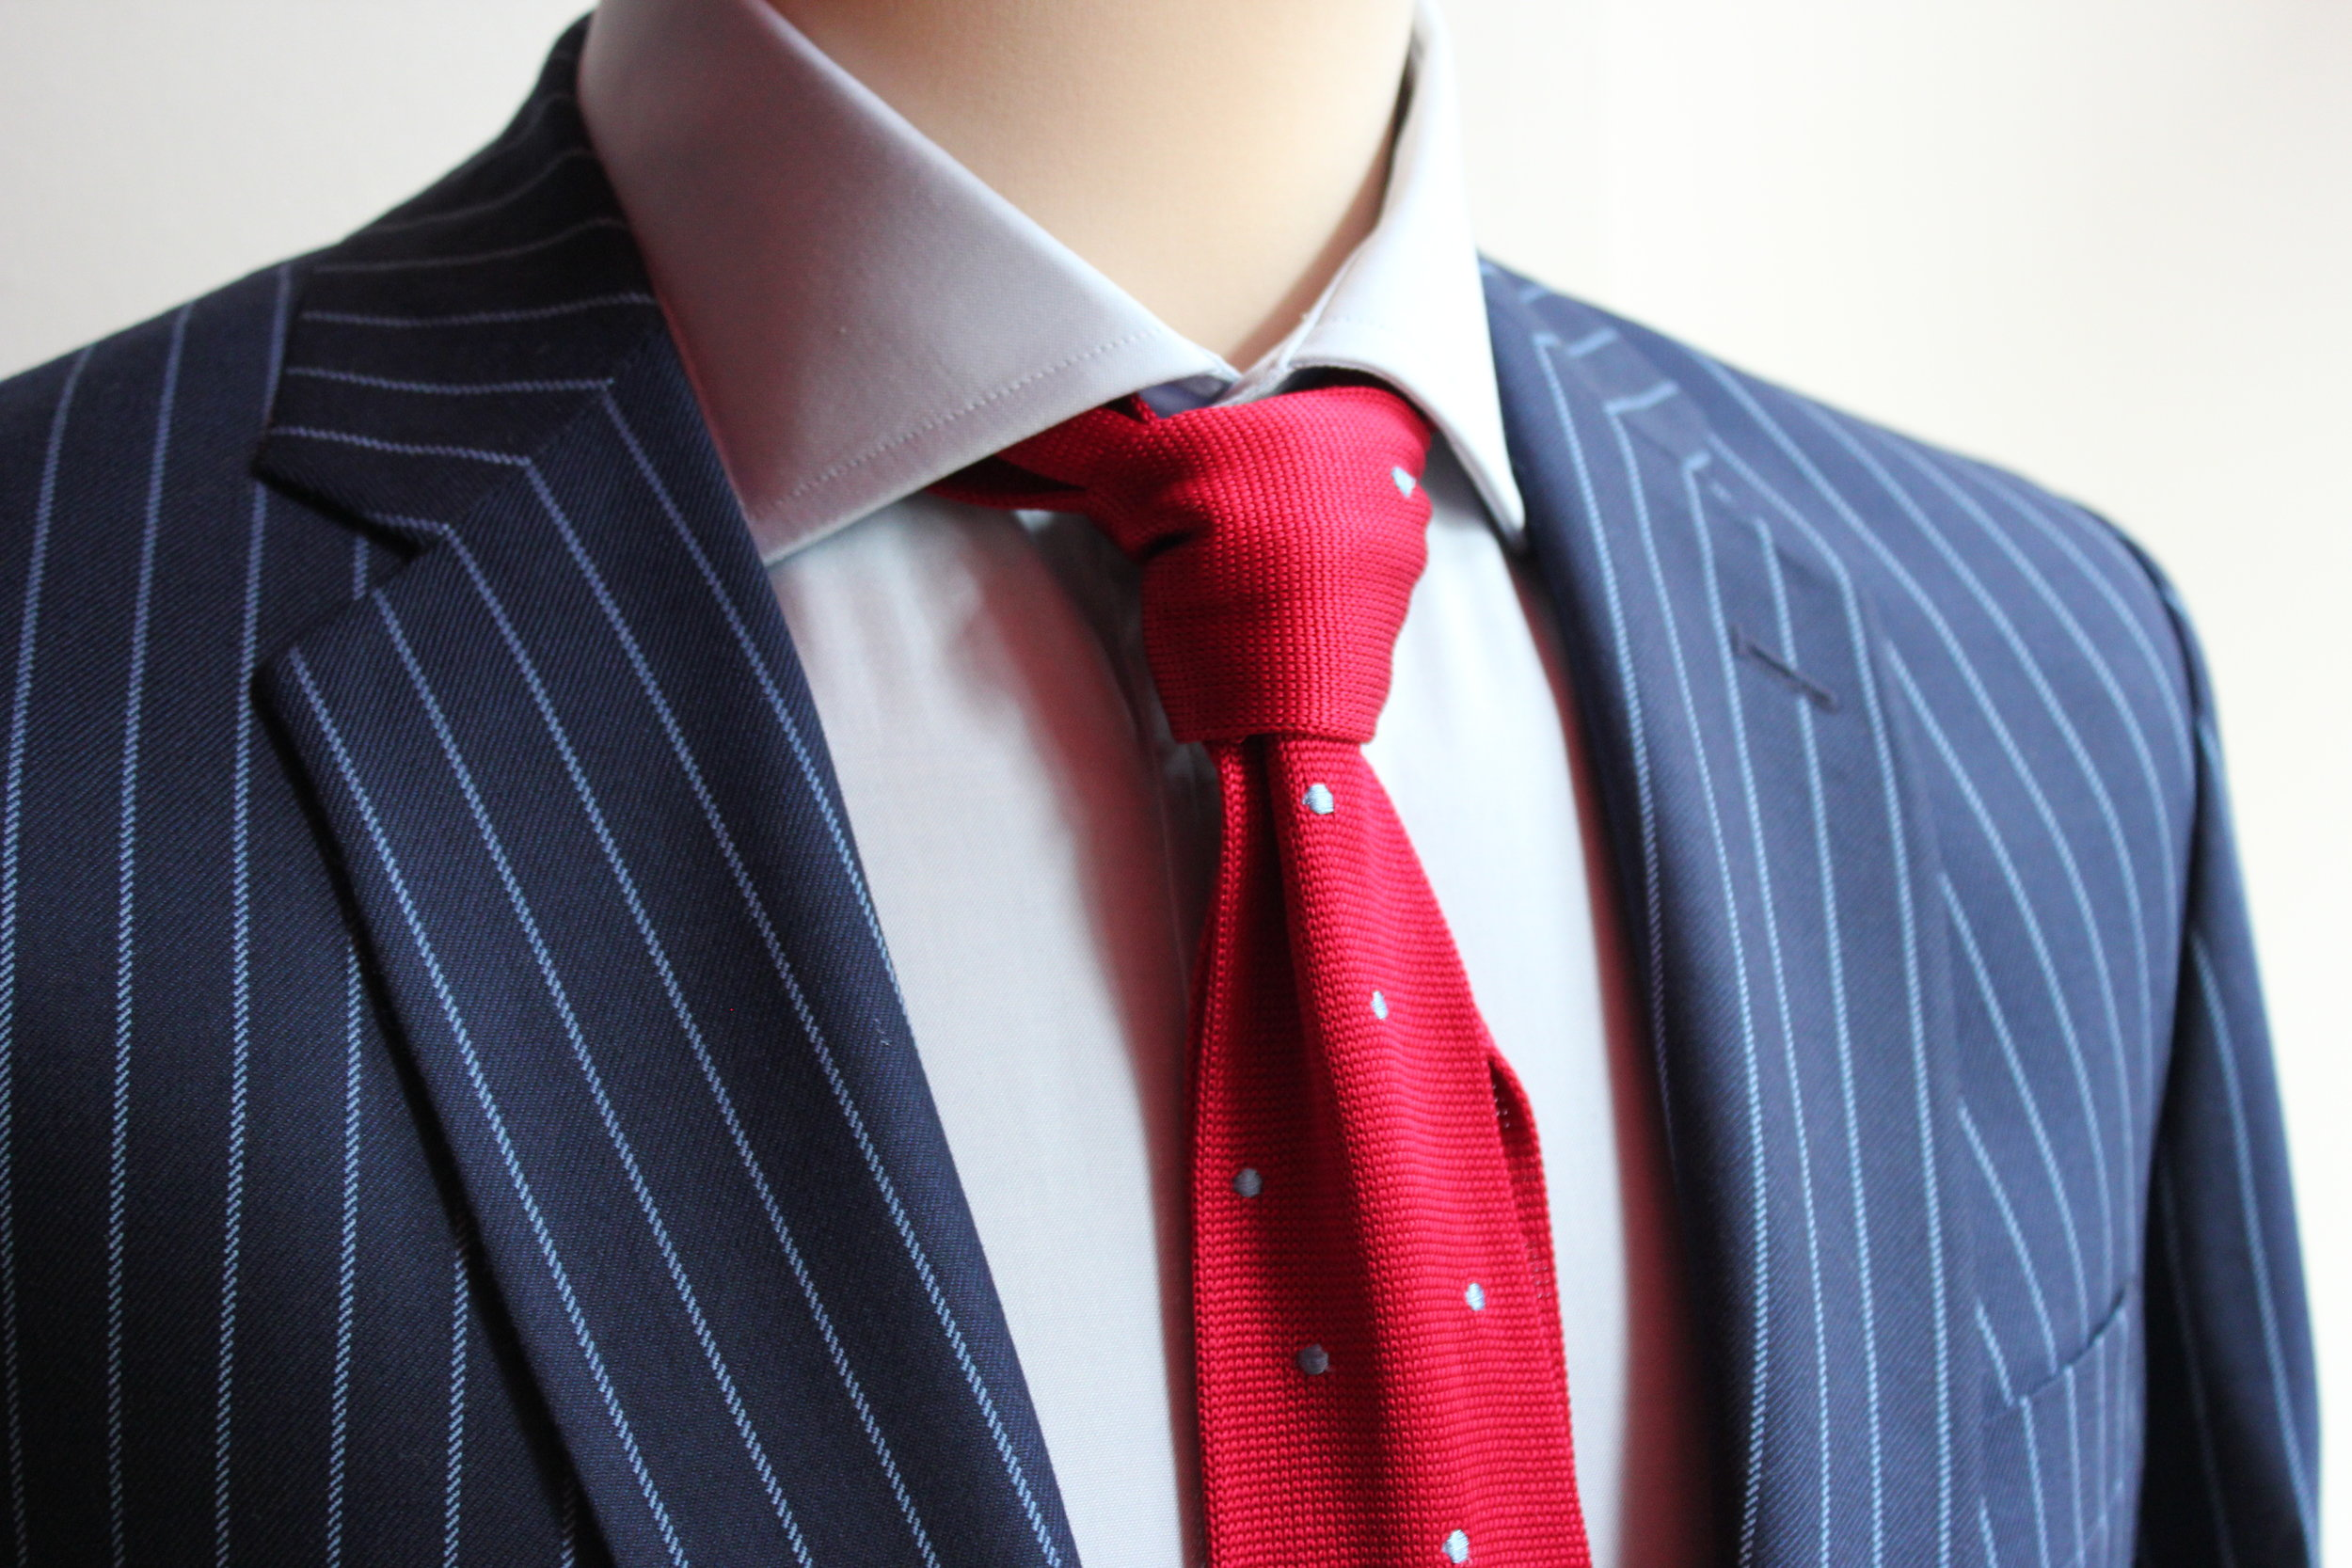 blue-chalk-stripe-harrisons-british-bespoke-tailoring-shirt-augustus-hare-knitted-tie-all-uk-made.JPG